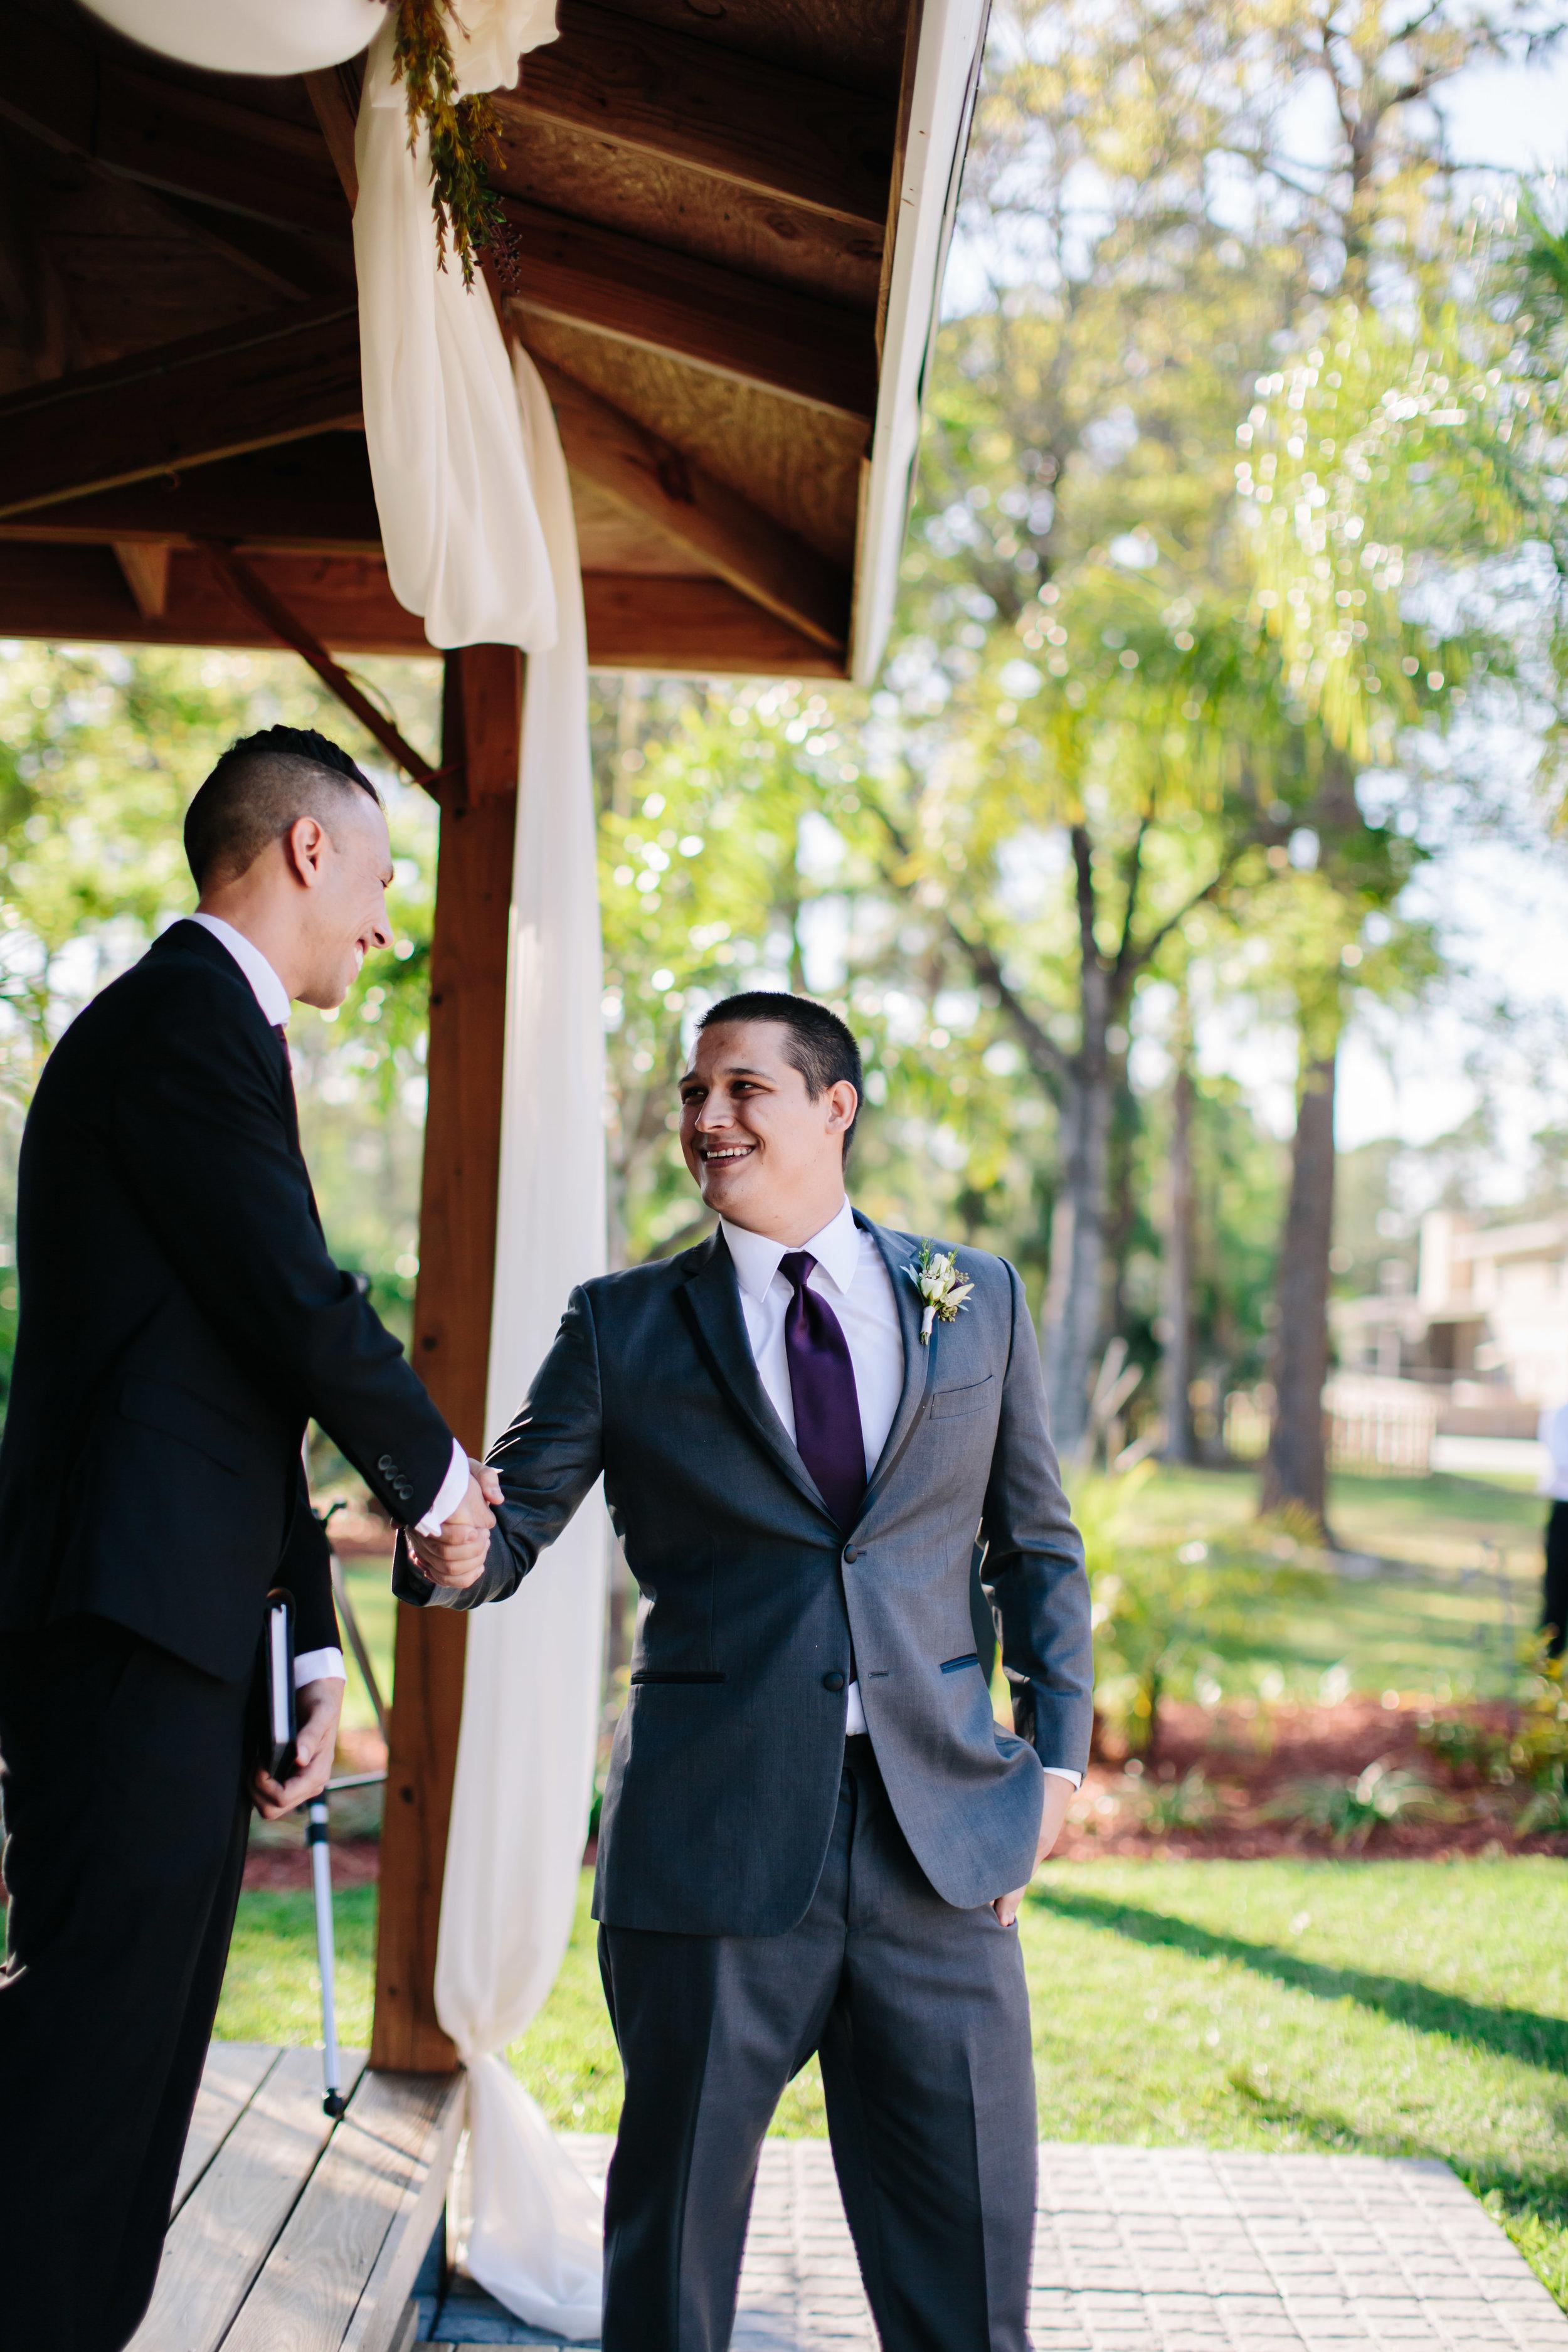 2018.02.17 Whitney and Joe Meyer Melbourne Wedding (215 of 759).jpg